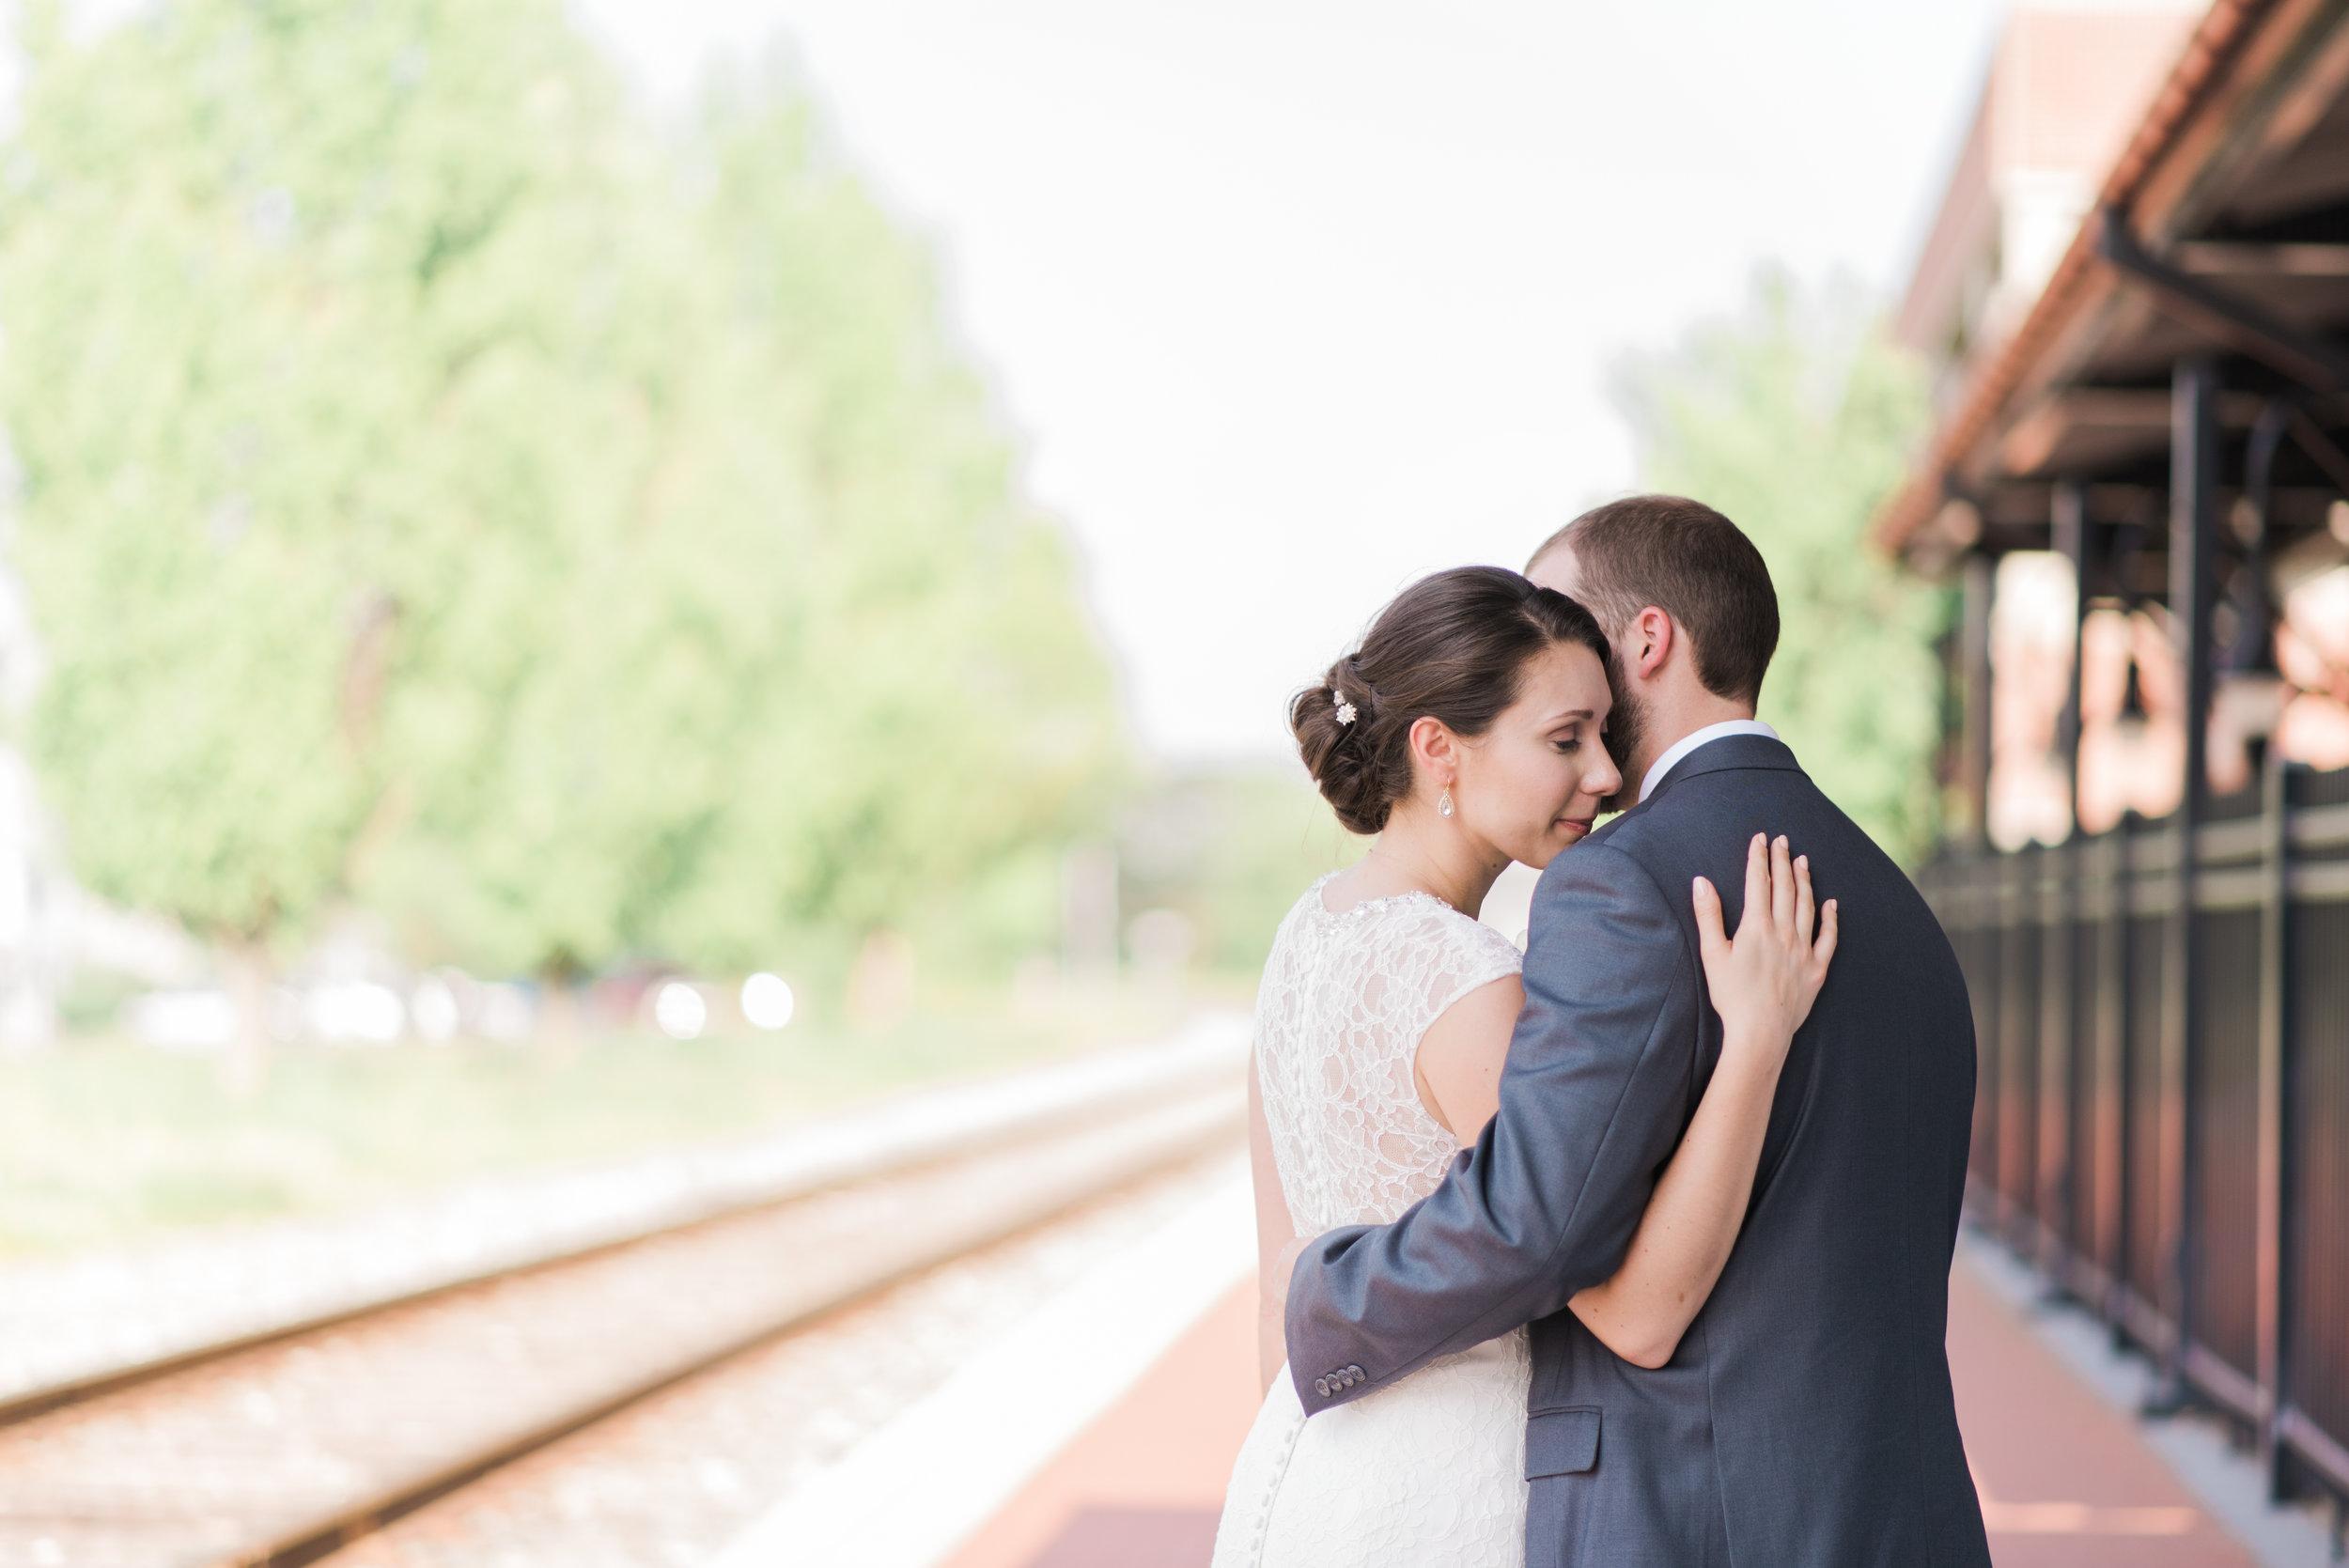 Mccoy-Emmett Wedding-233.jpg